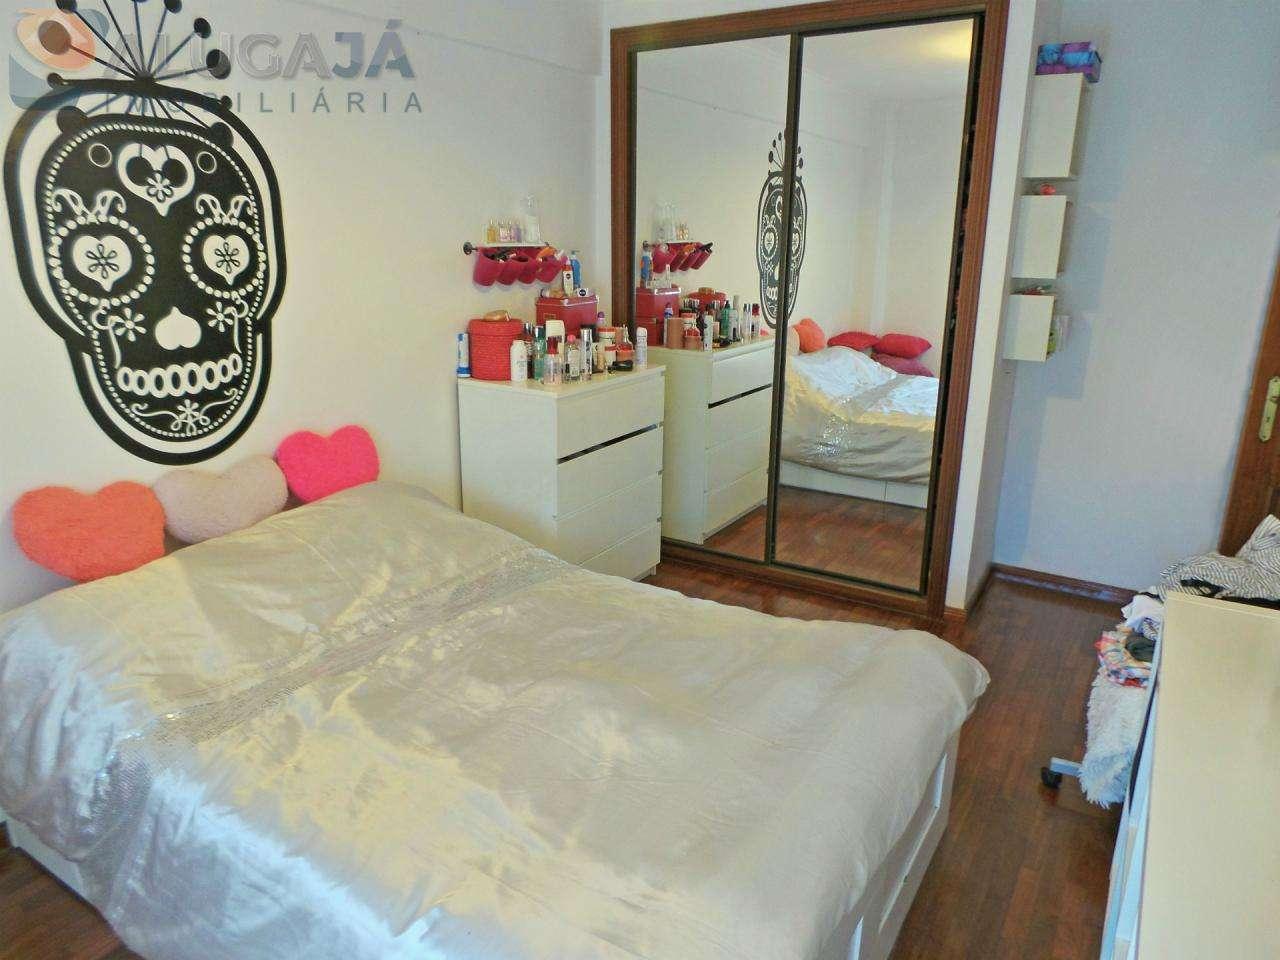 Apartamento para comprar, Vialonga, Vila Franca de Xira, Lisboa - Foto 18